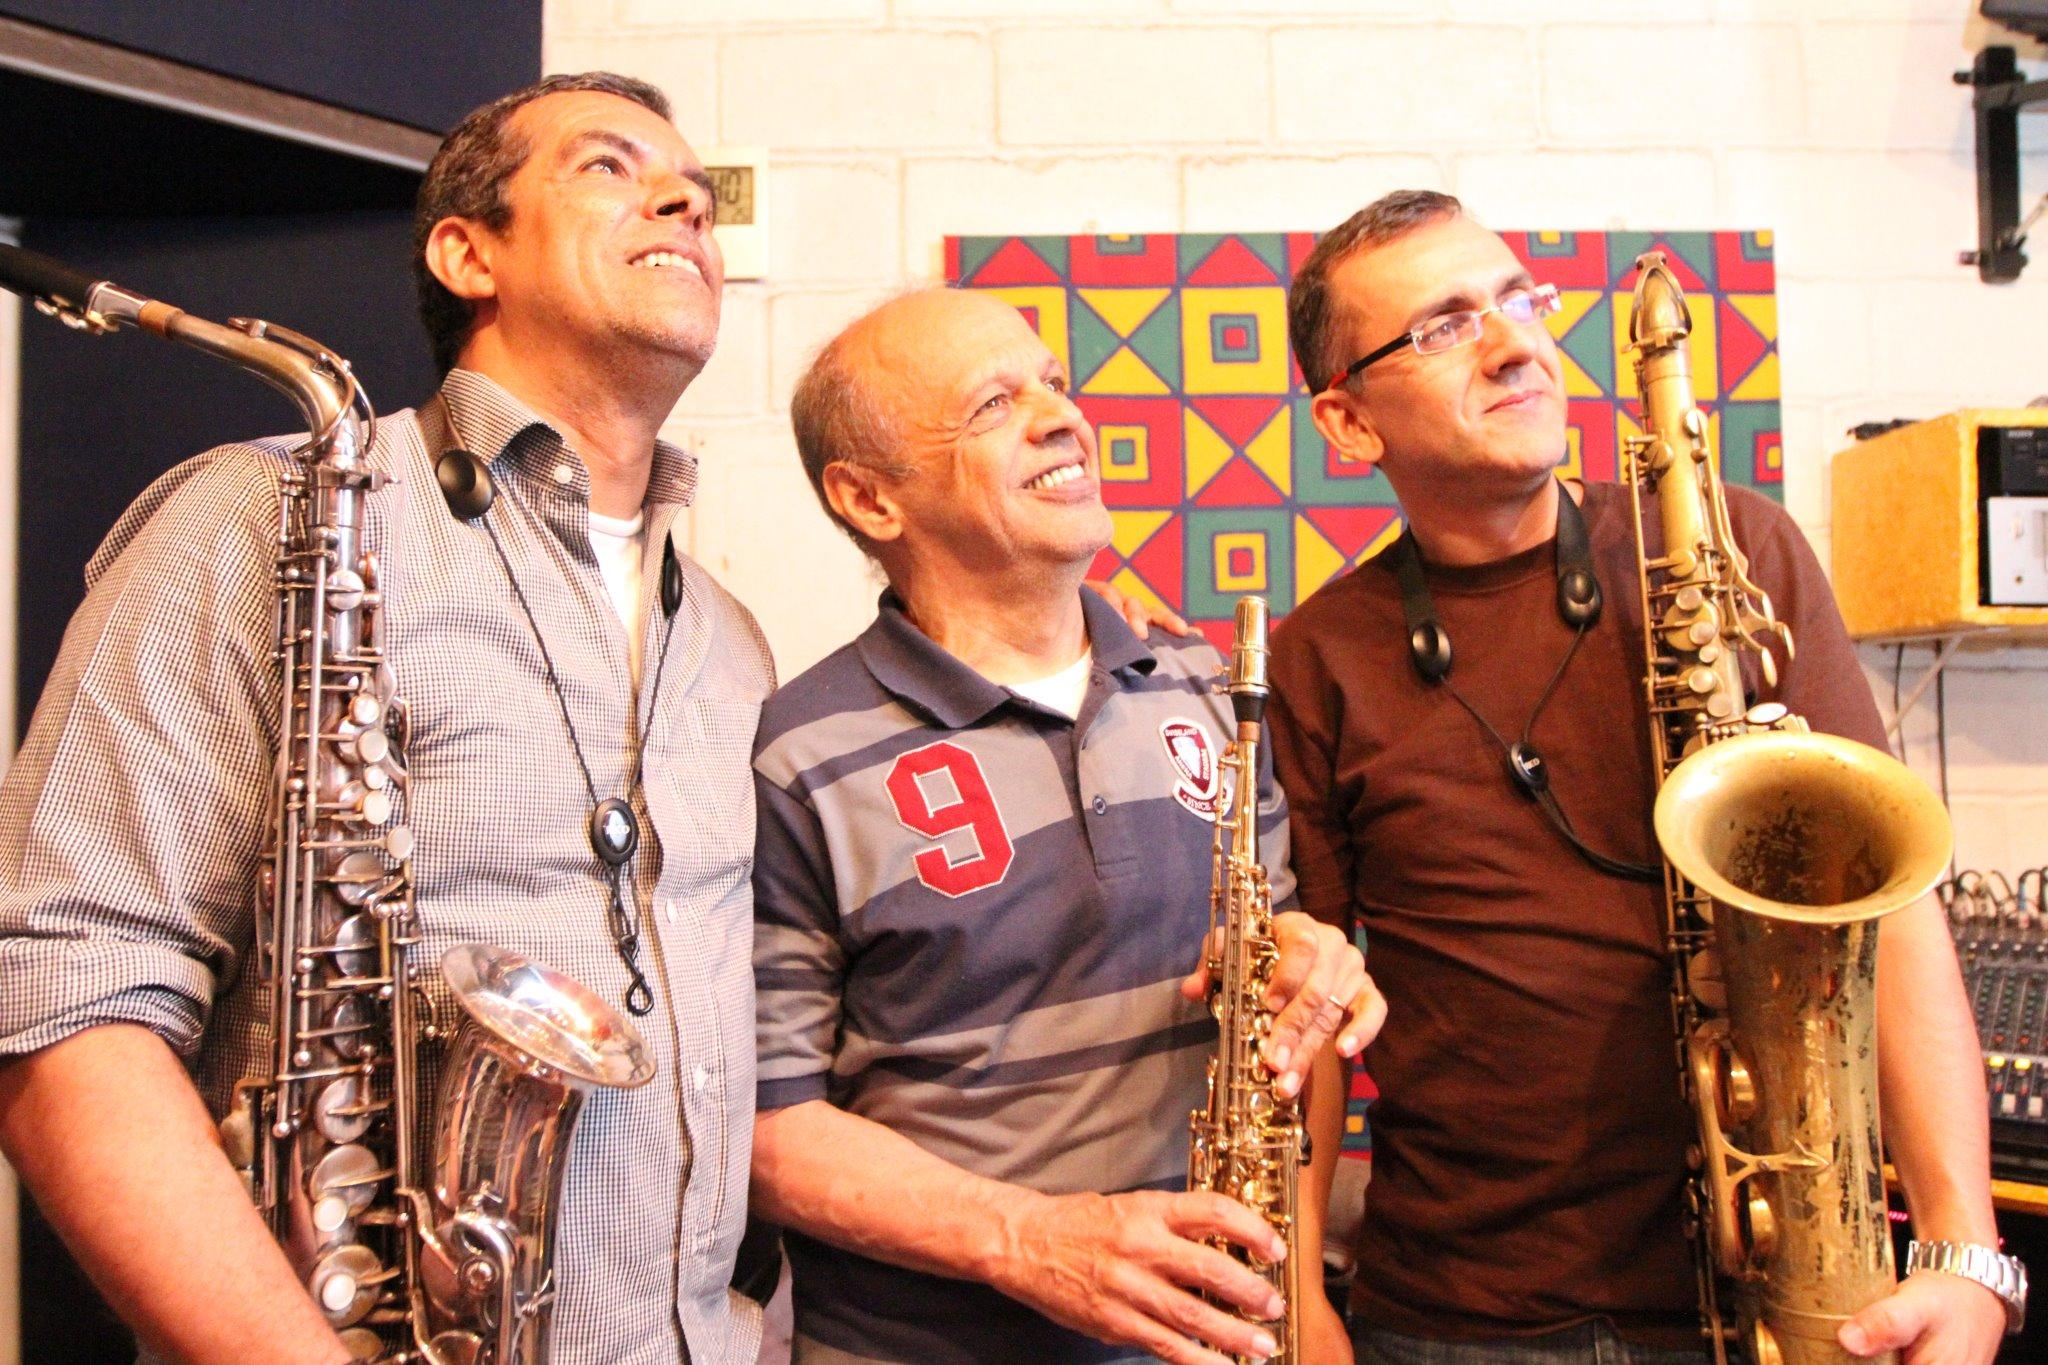 Festival de saxofone 2012